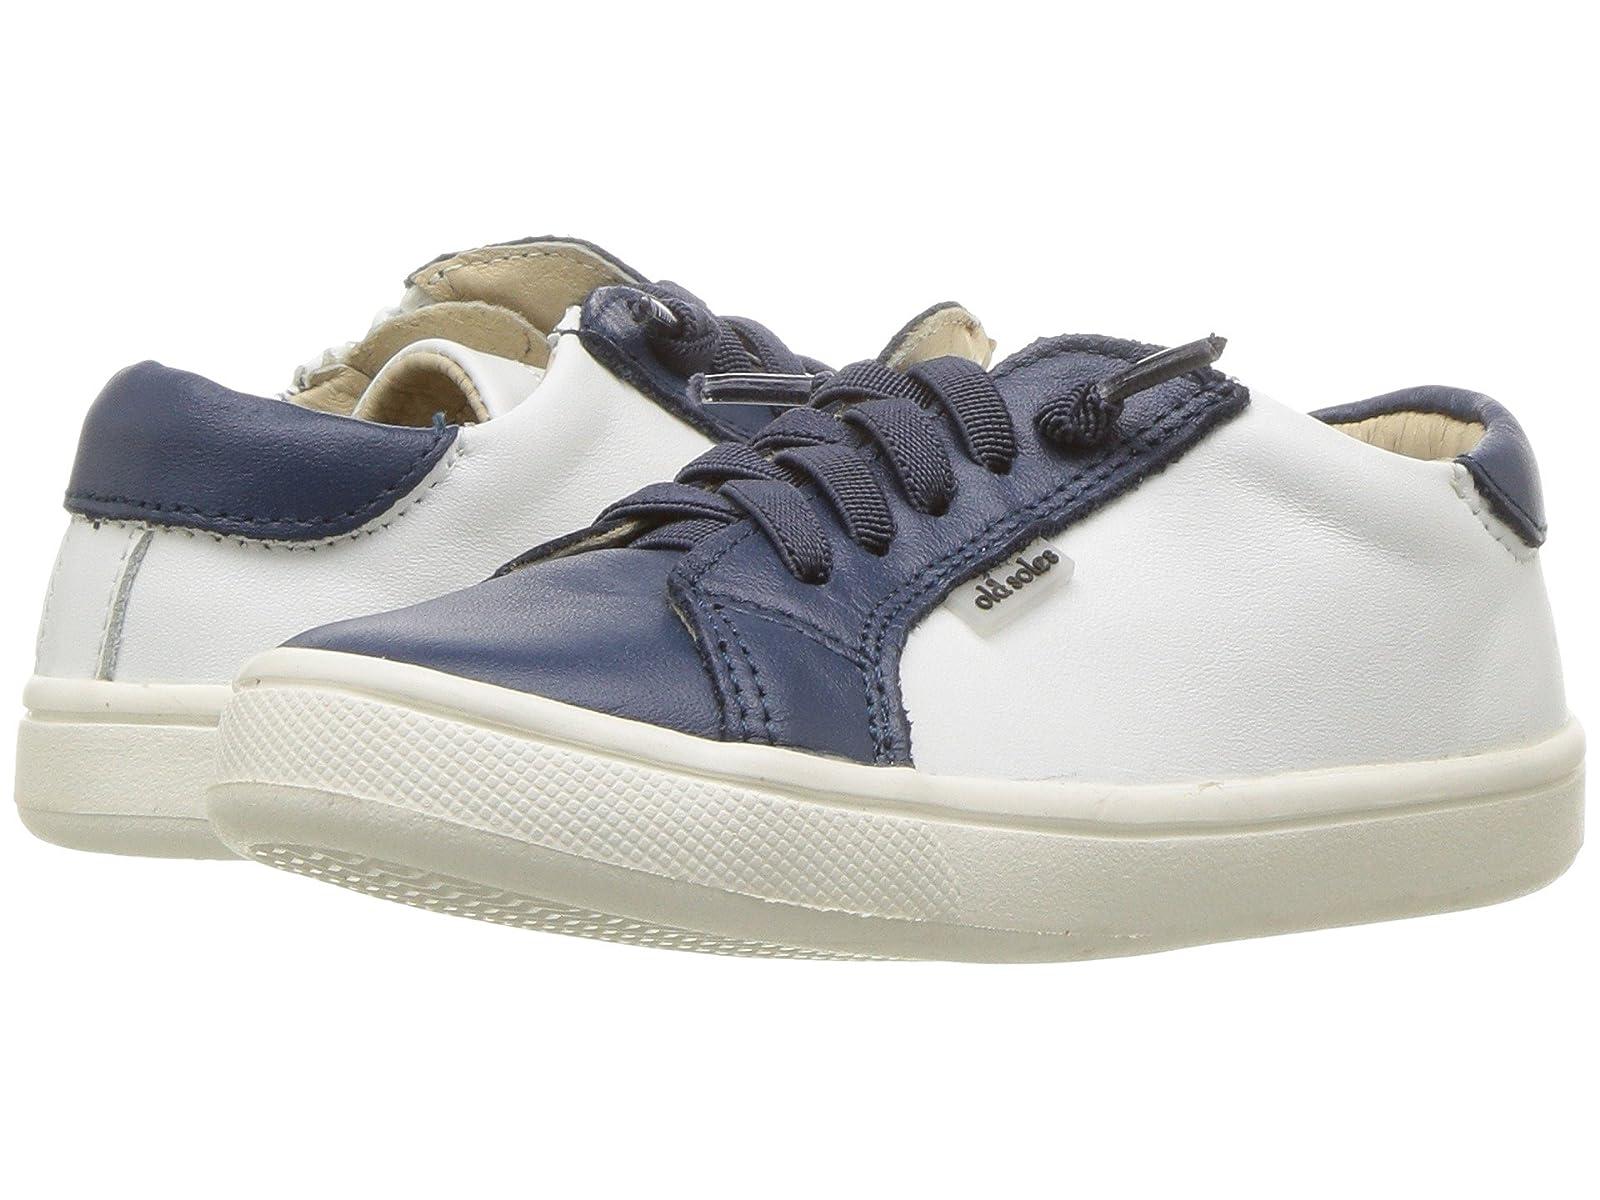 Old Soles Thor Runner (Toddler/Little Kid)Atmospheric grades have affordable shoes